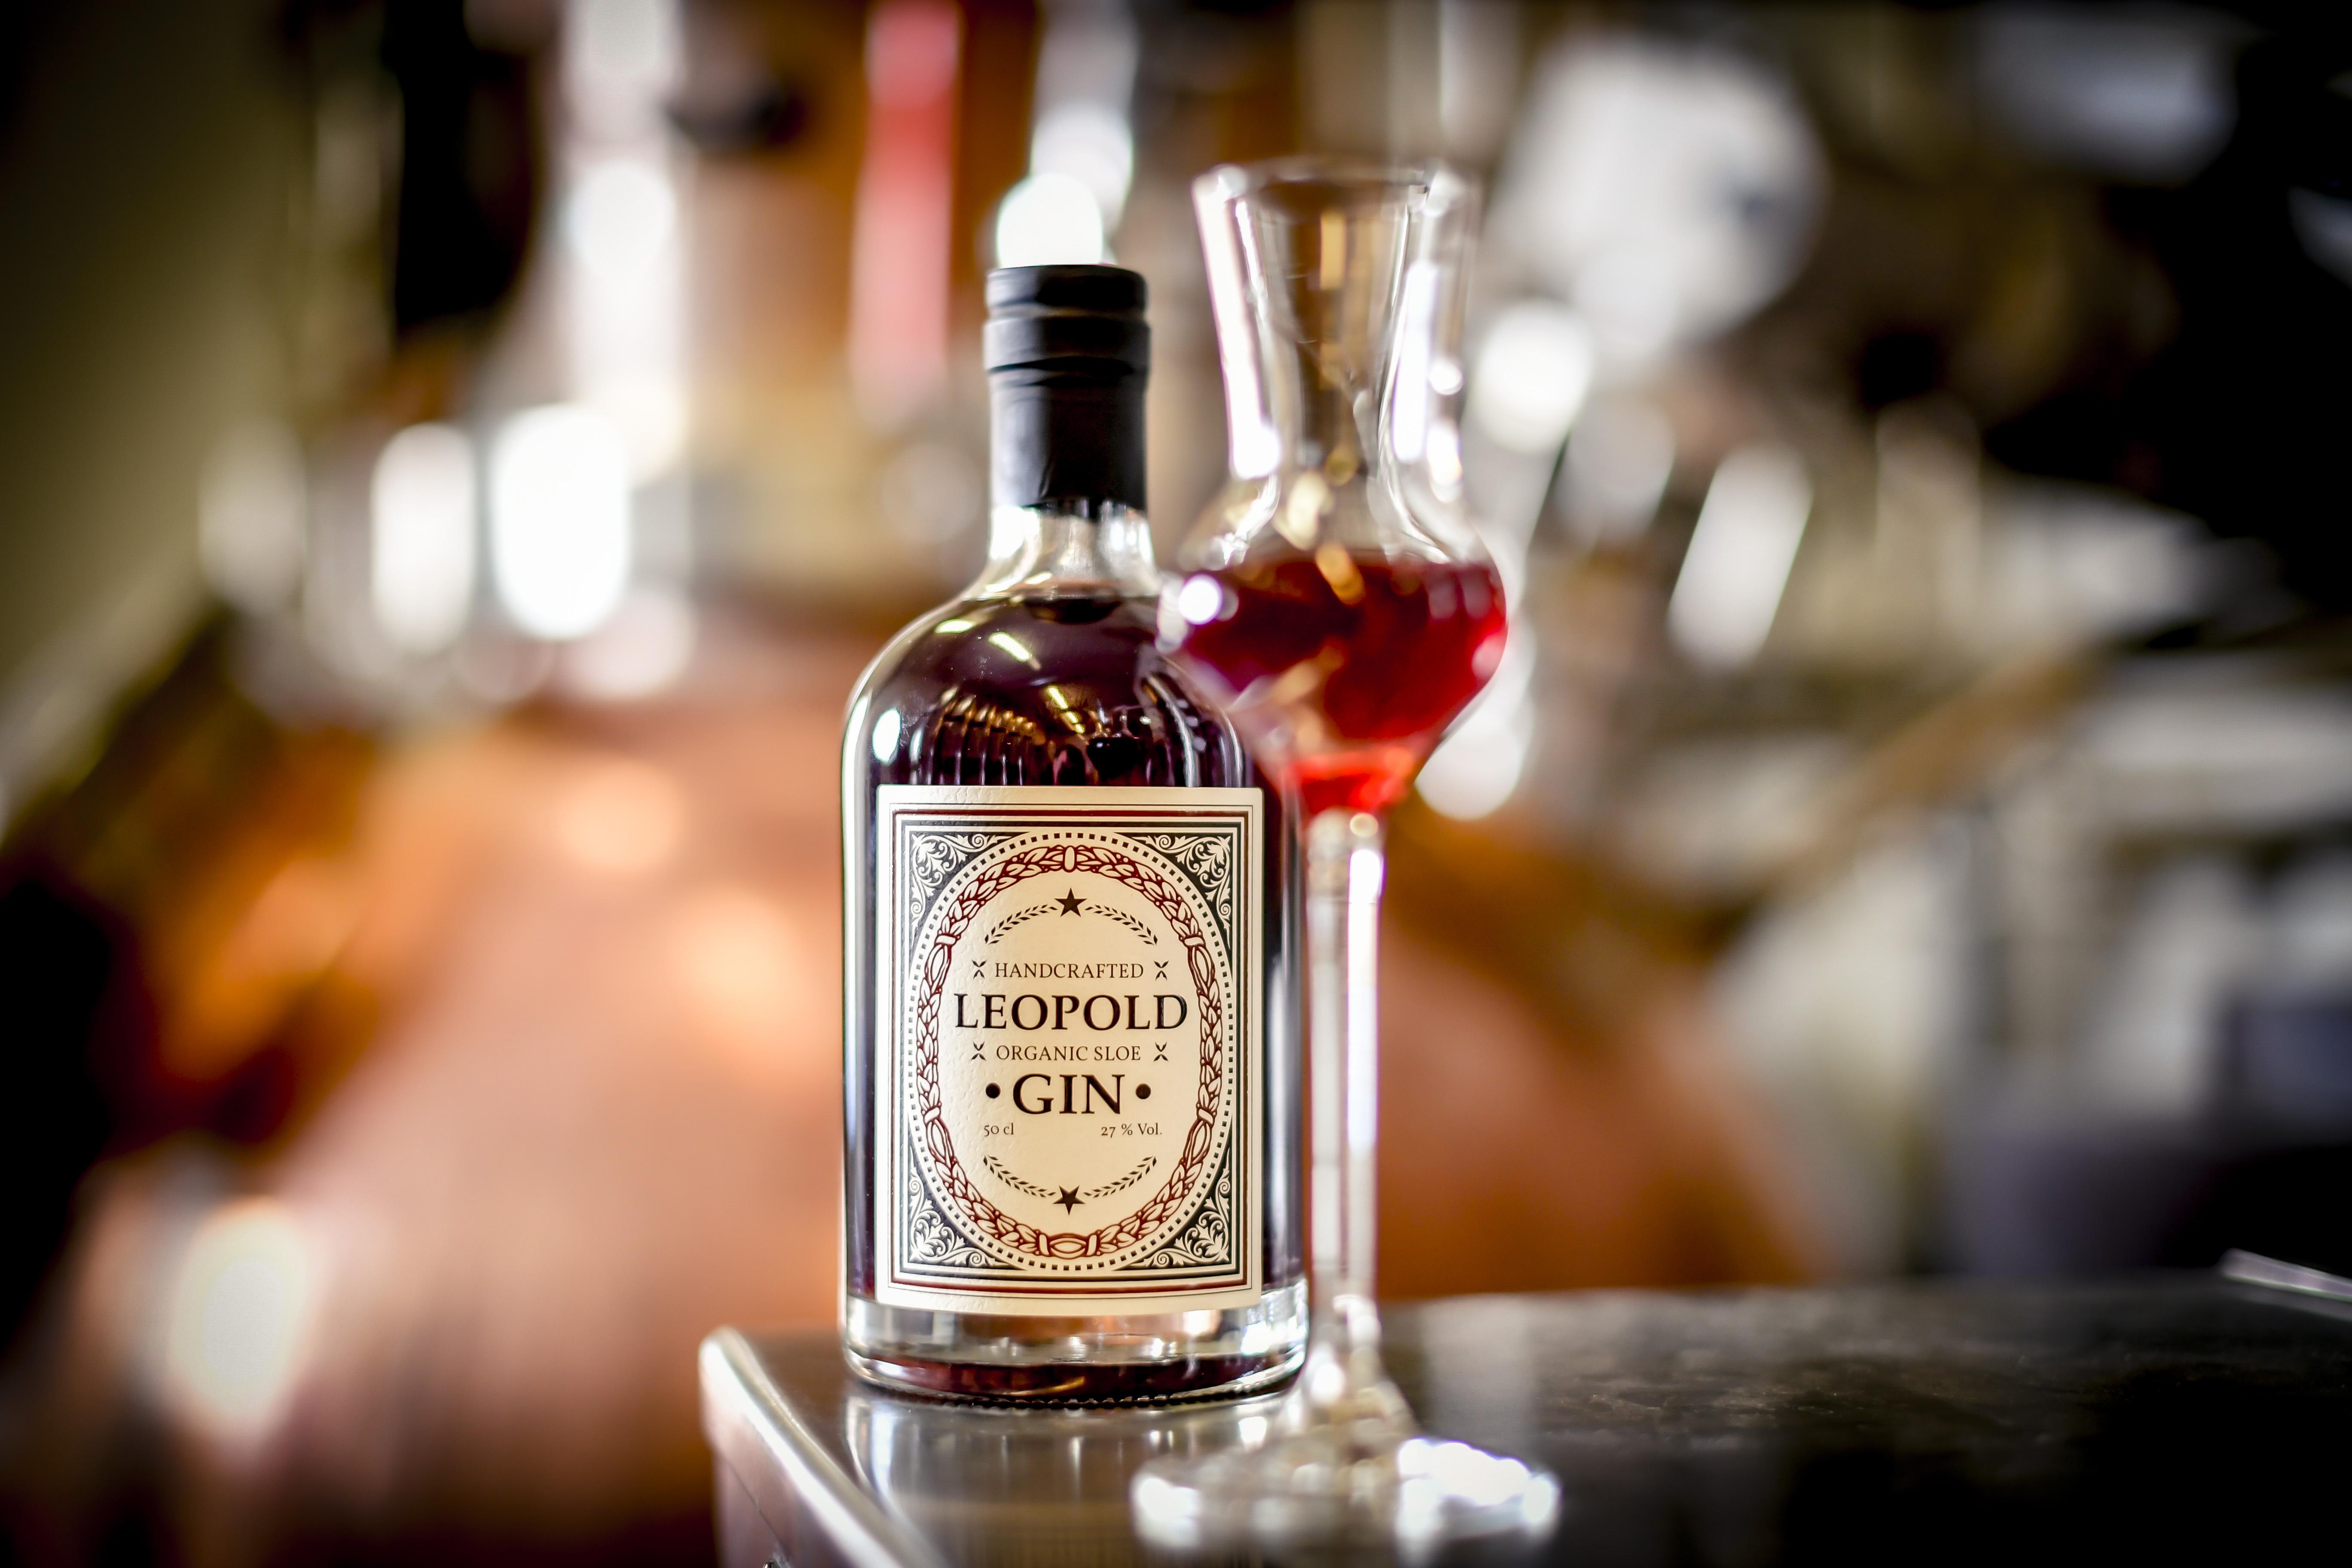 Leopold Organic Sloe Gin